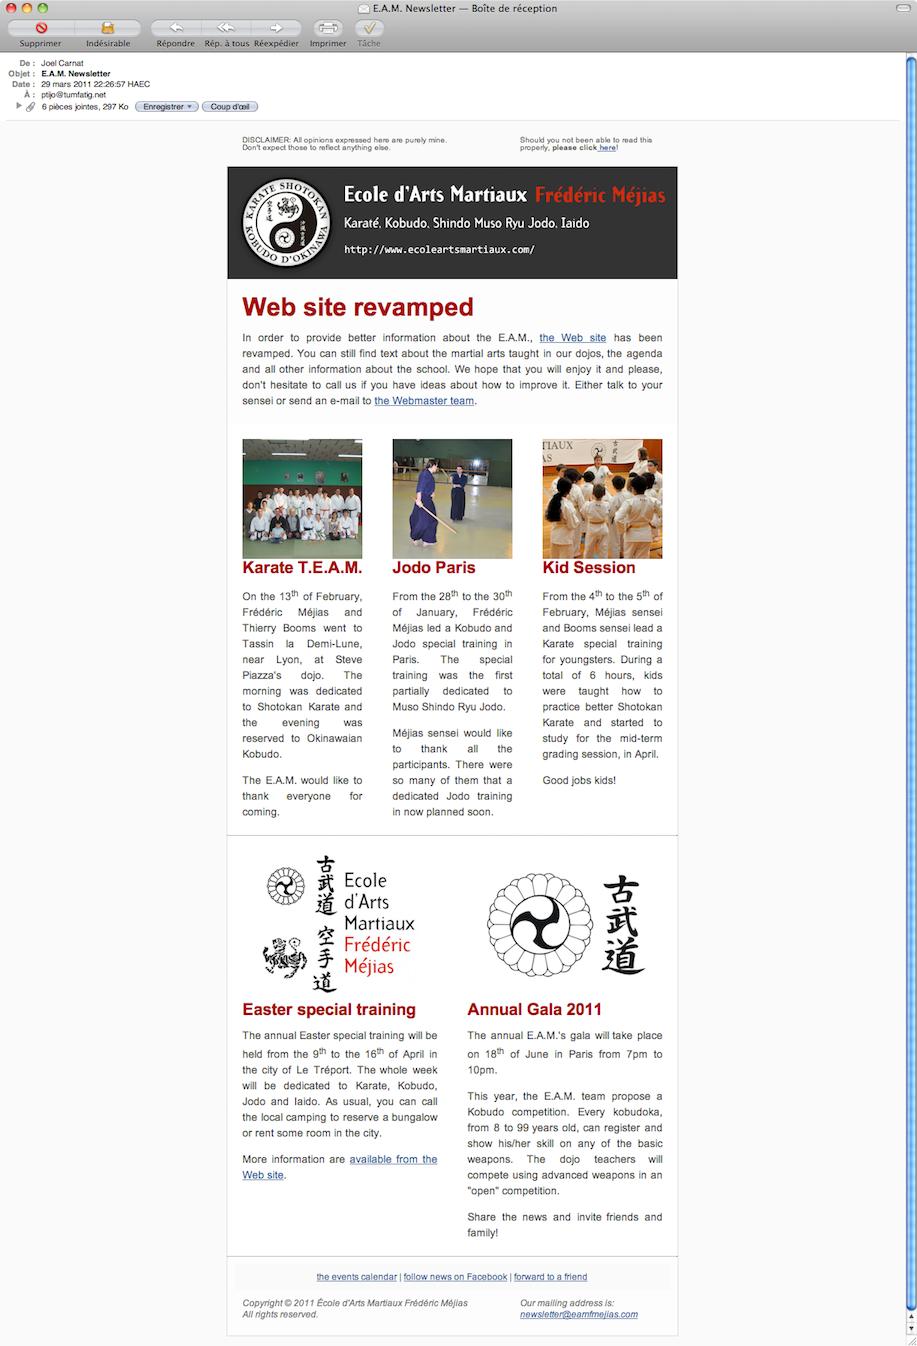 Newsletter in Mac Mail